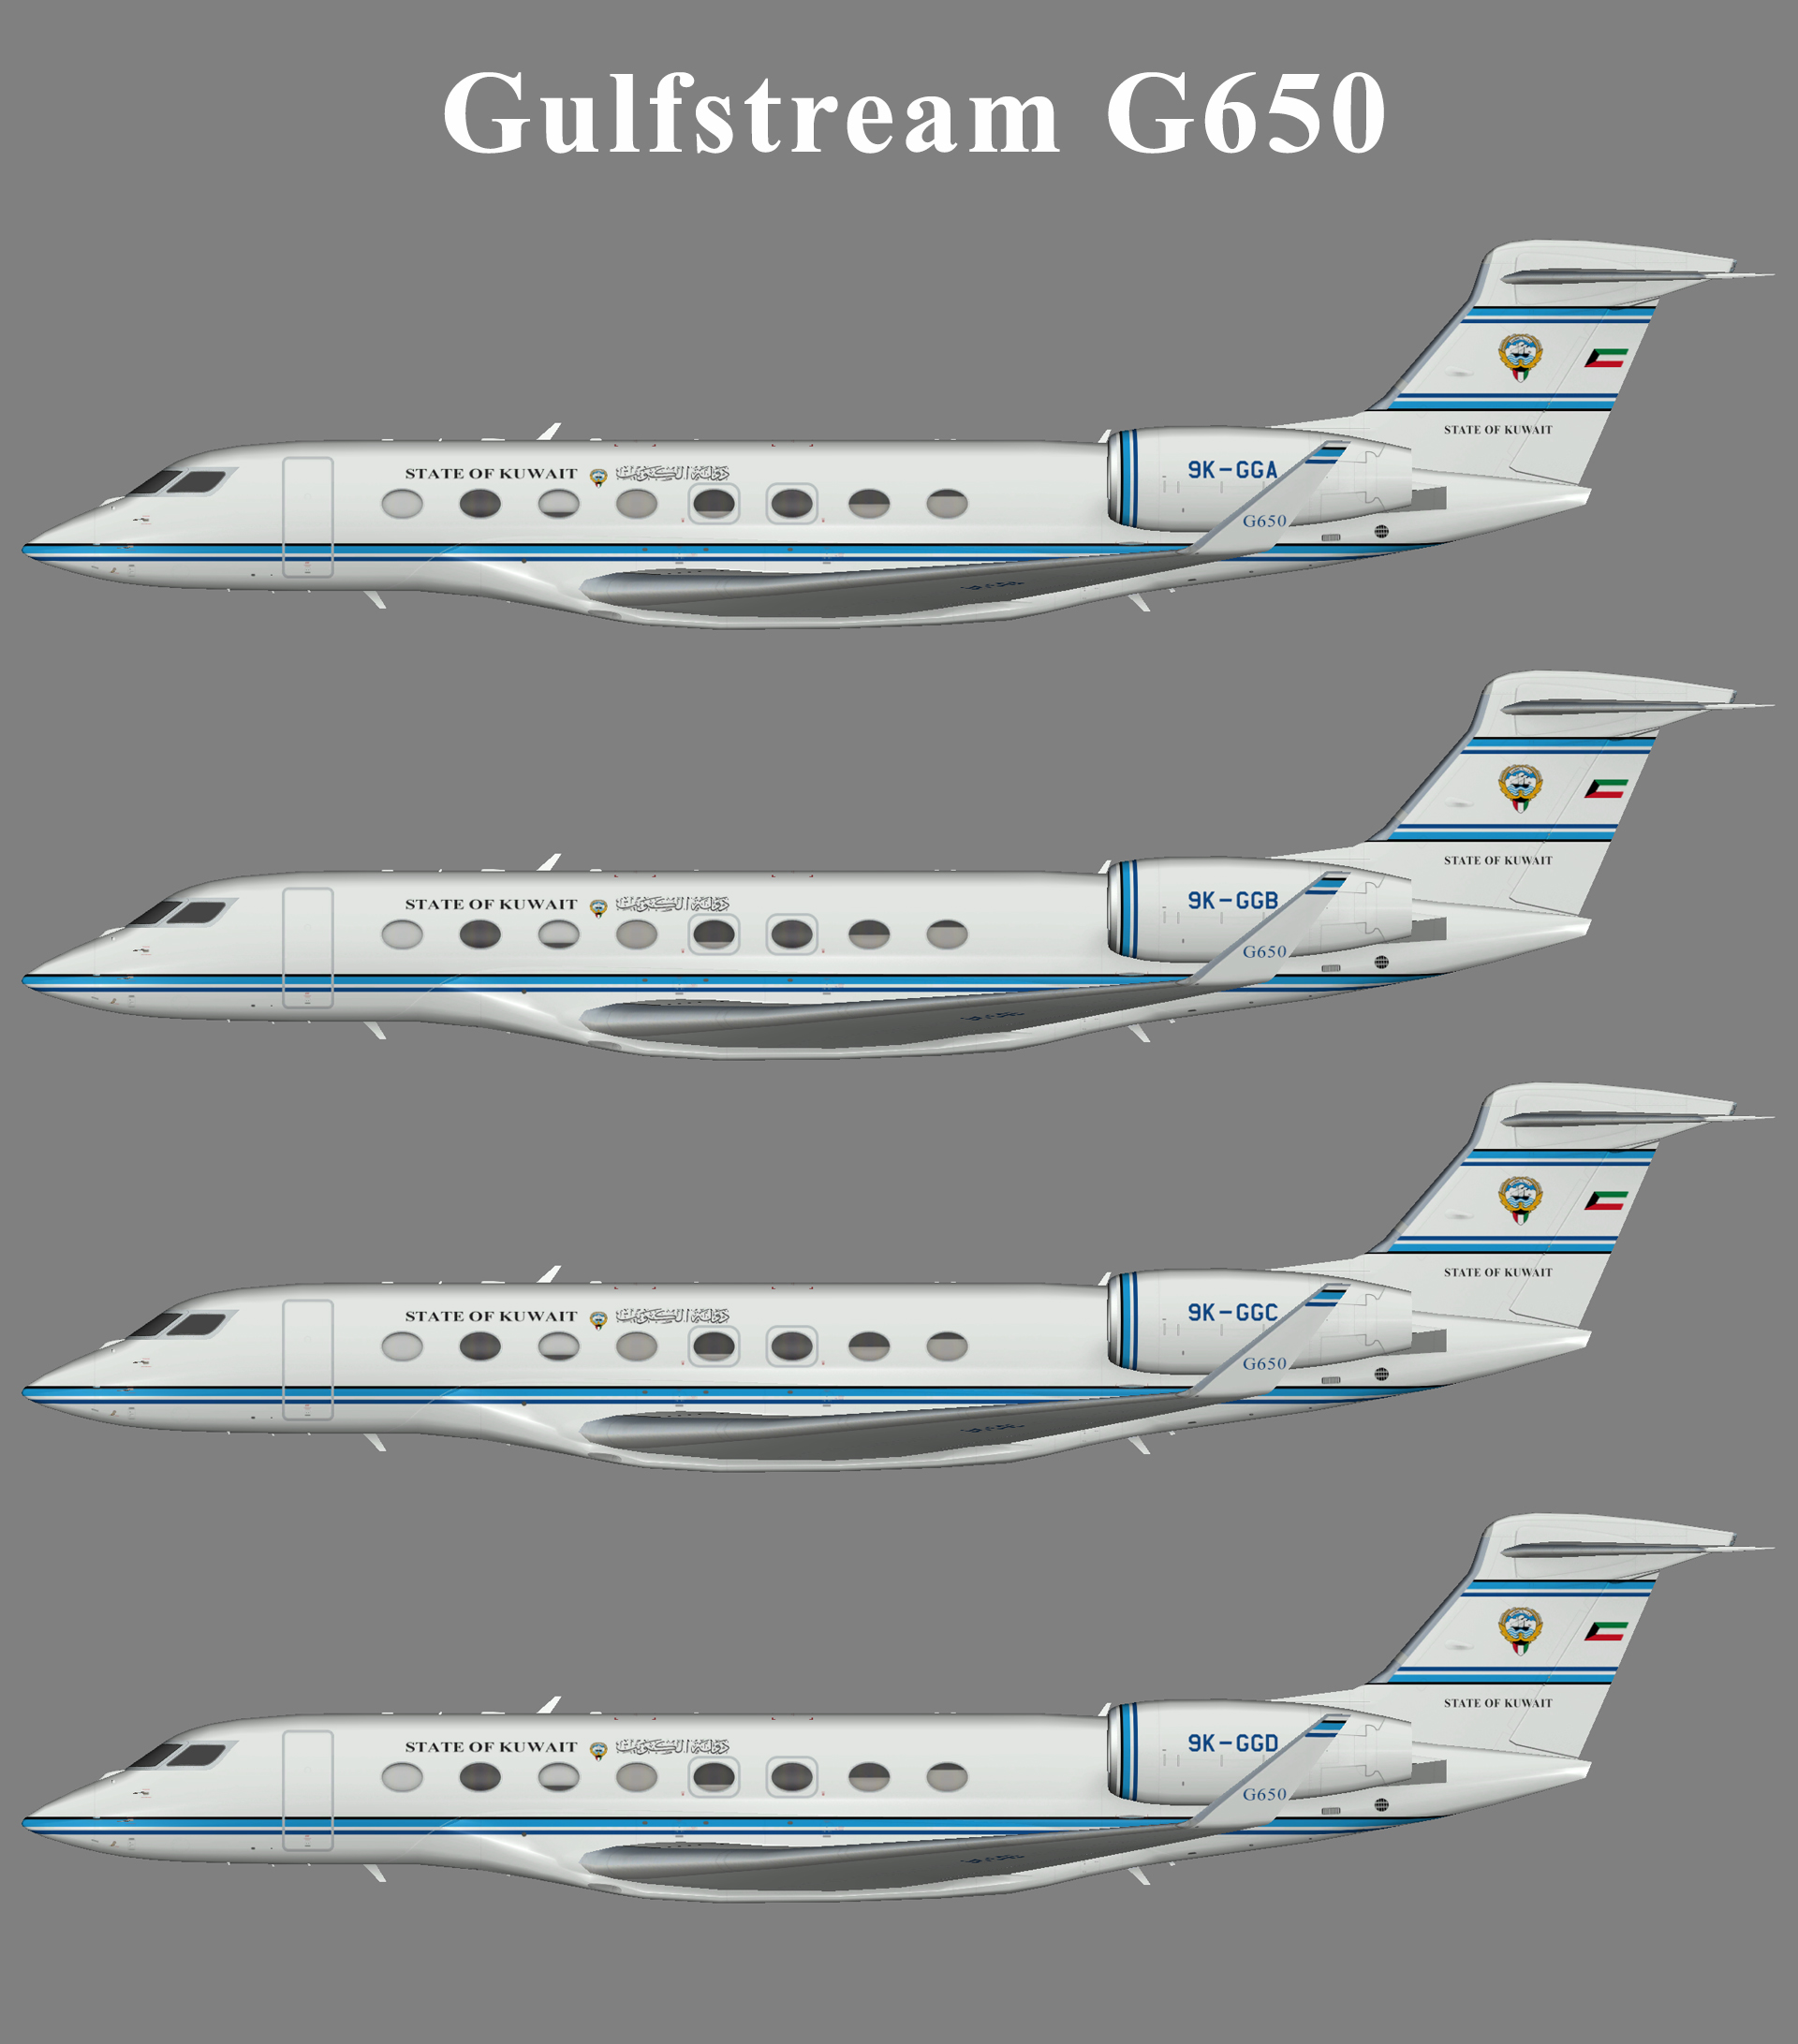 State of Kuwait Gulfstream G650